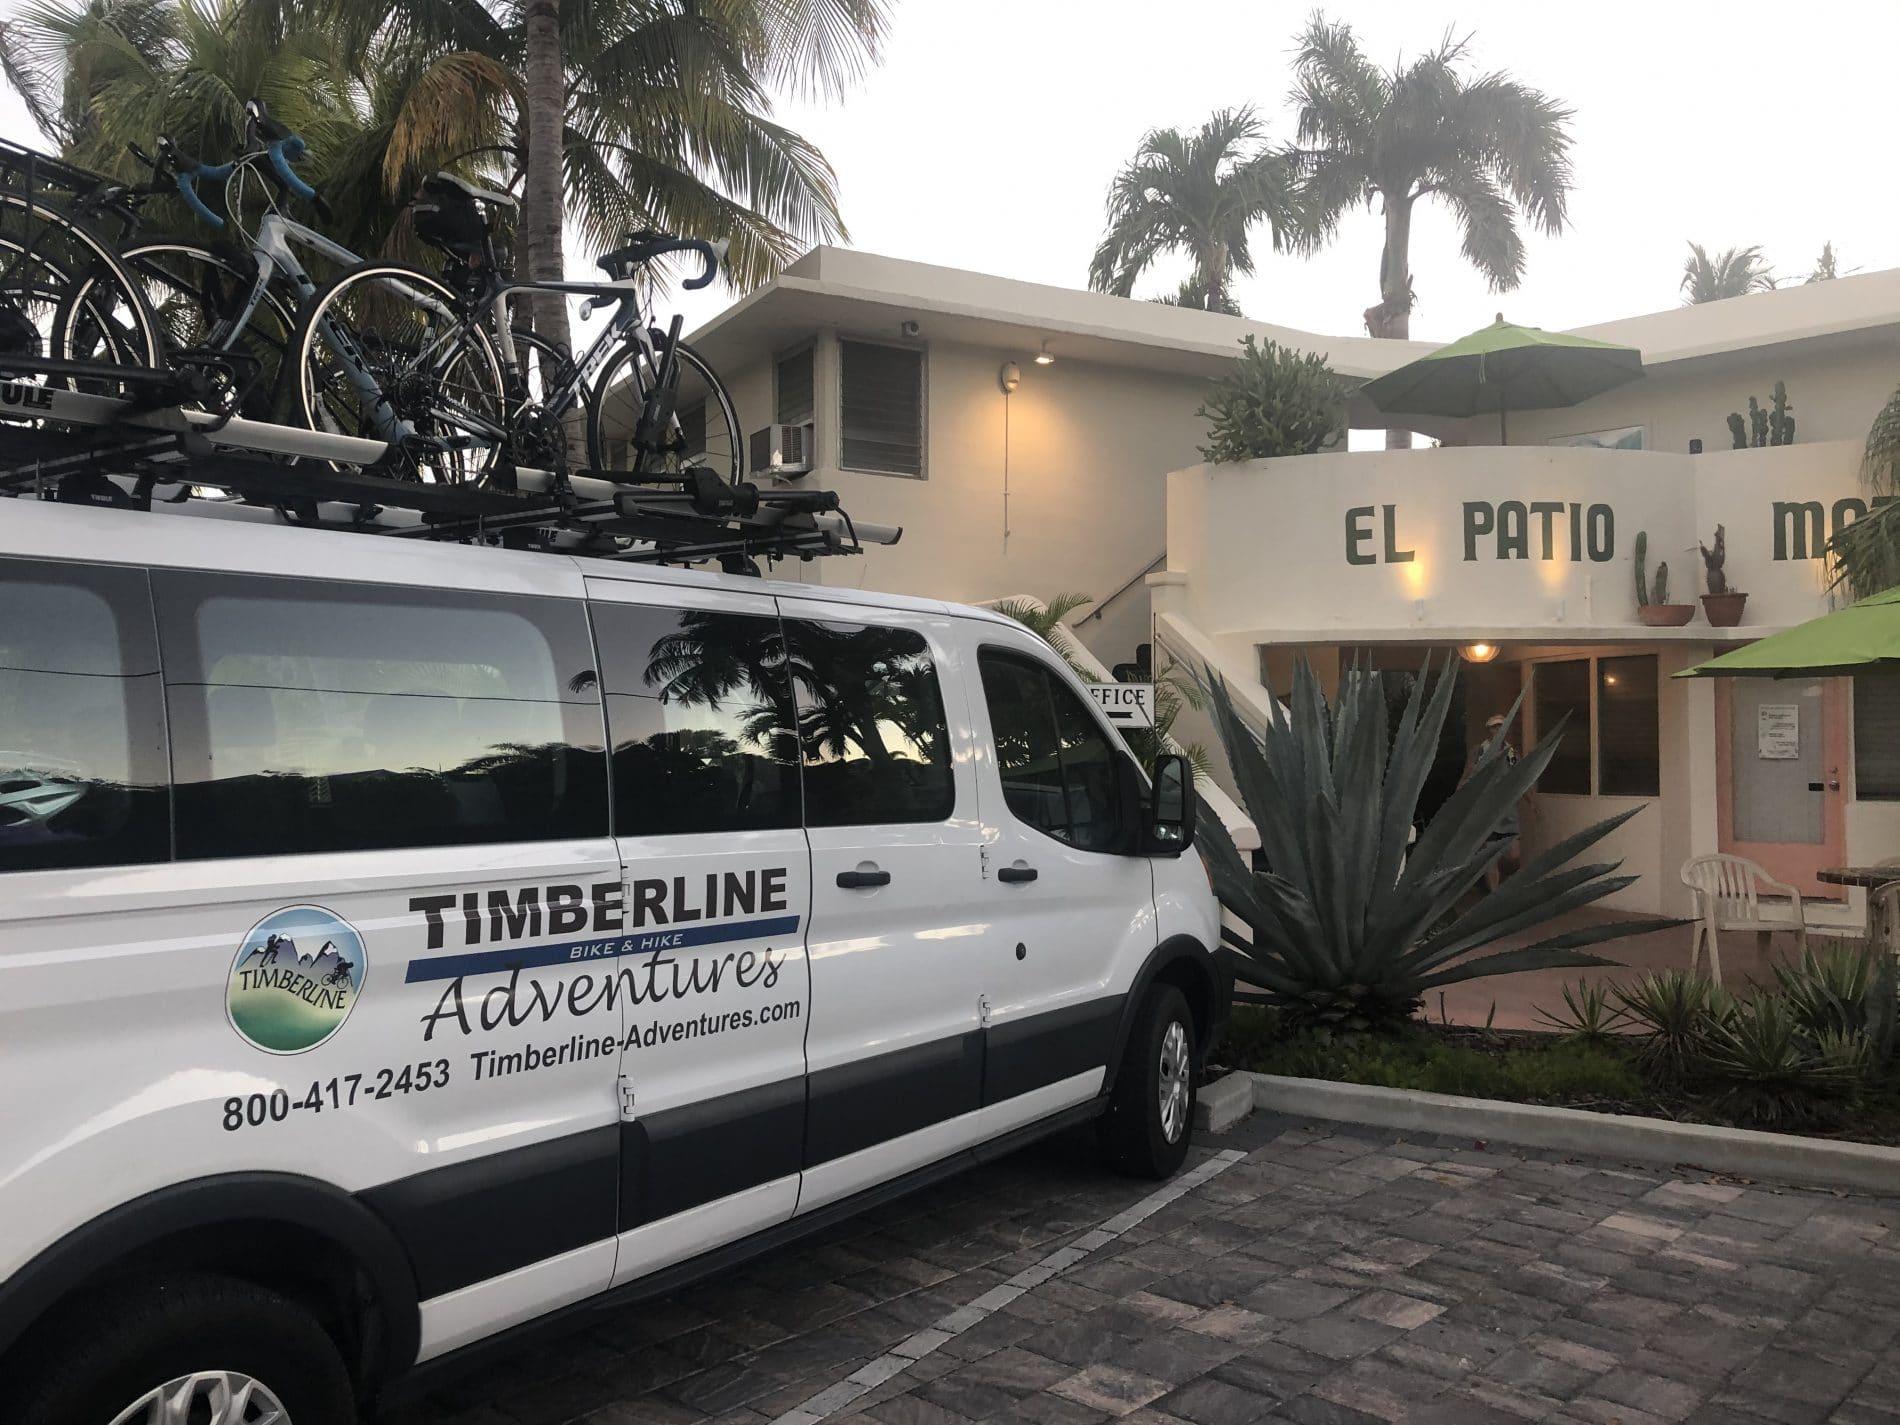 florida keys cycling tour timberline